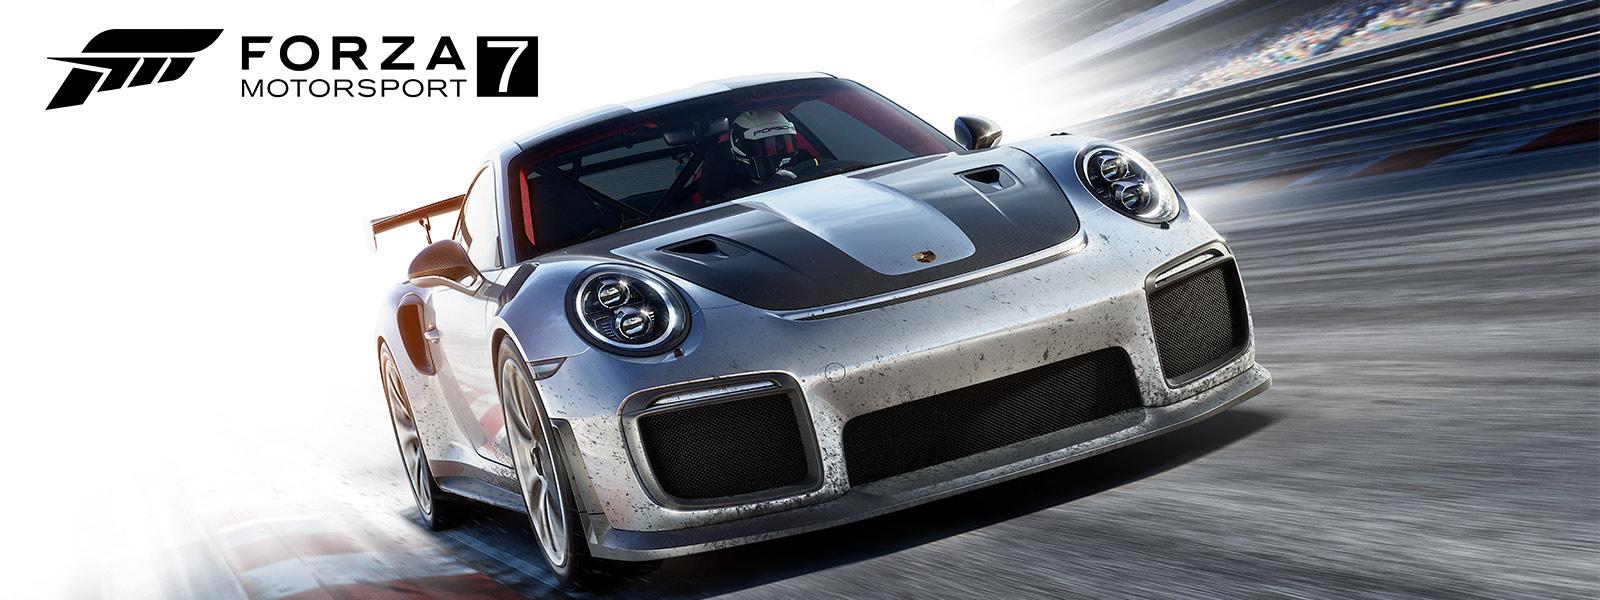 Écran du jeu Forza Motorsport7